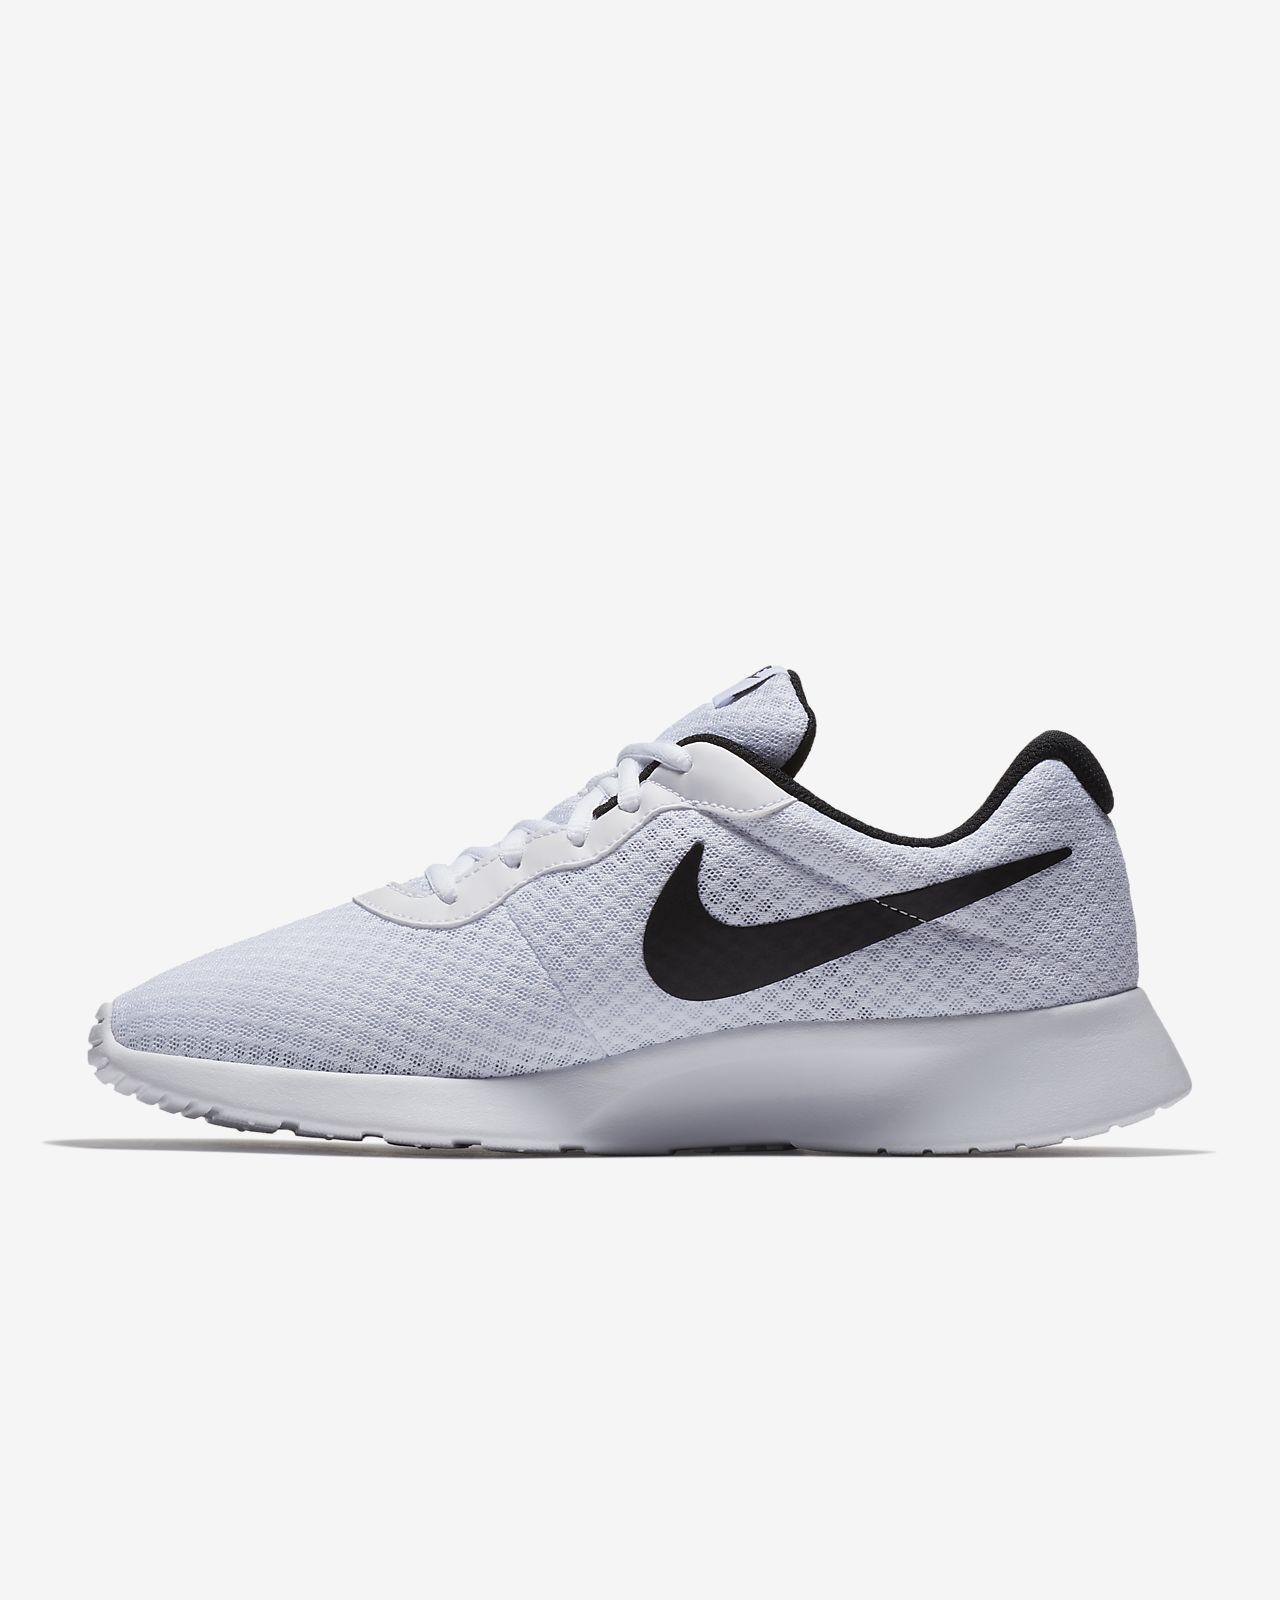 Chaussures Pour Hommes Nike Tanjun 812654 011 Noir running